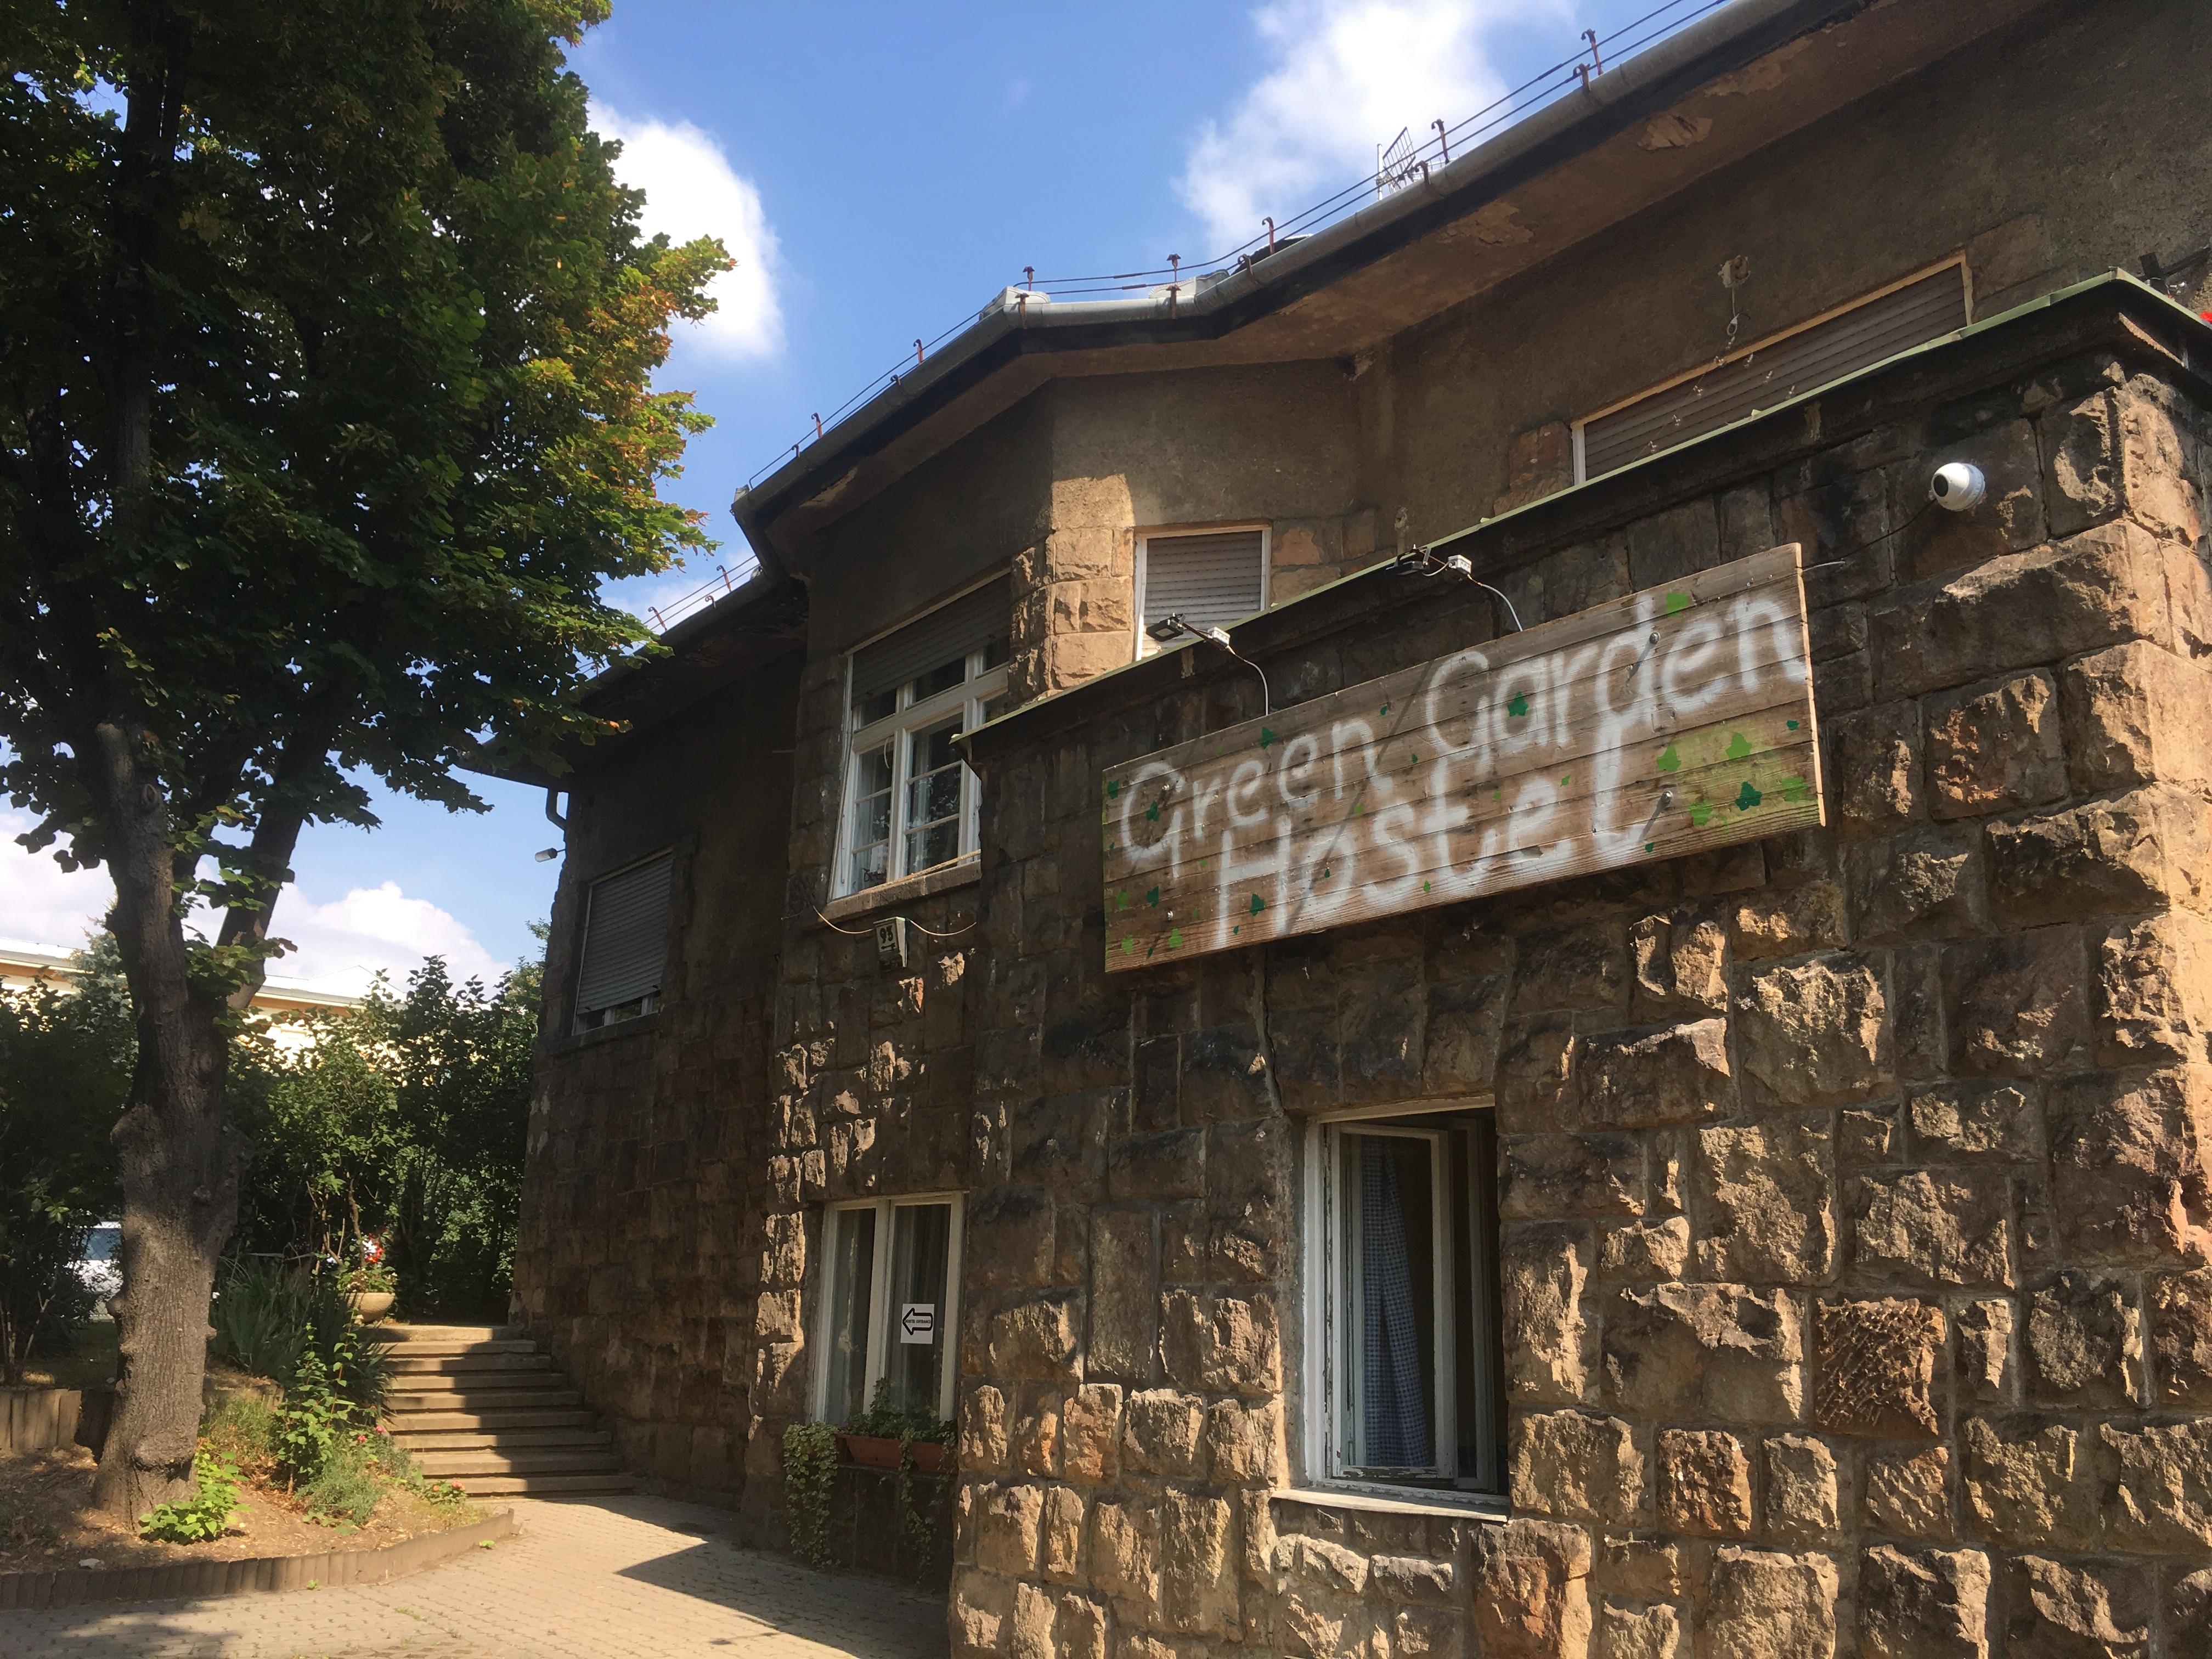 Green Garden Hostel